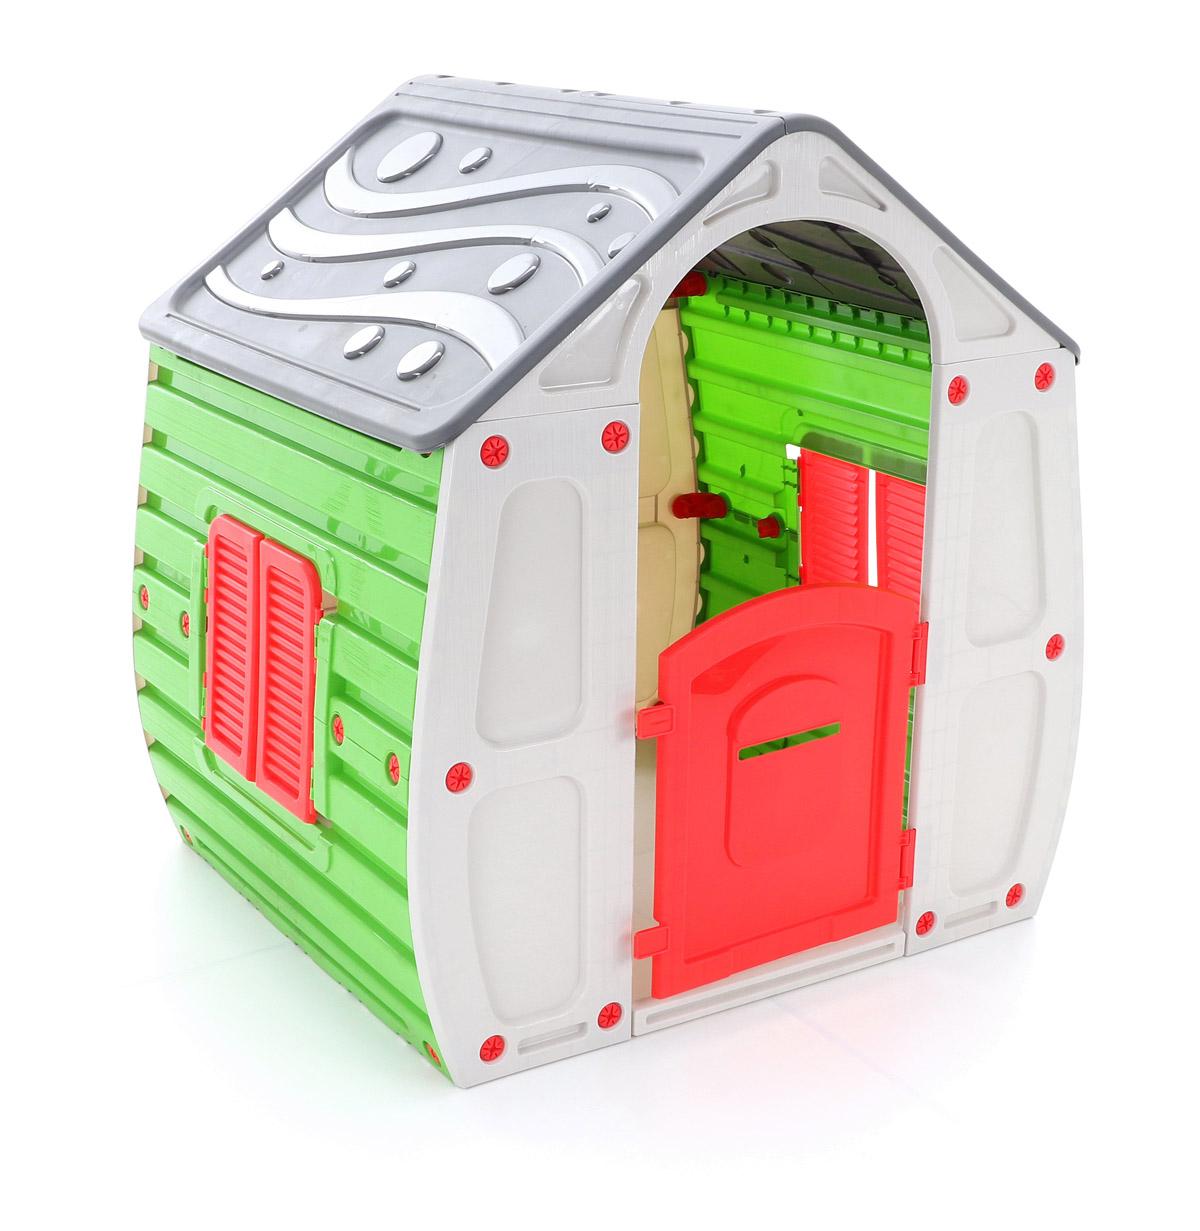 STARPLAST Magical House grey/green